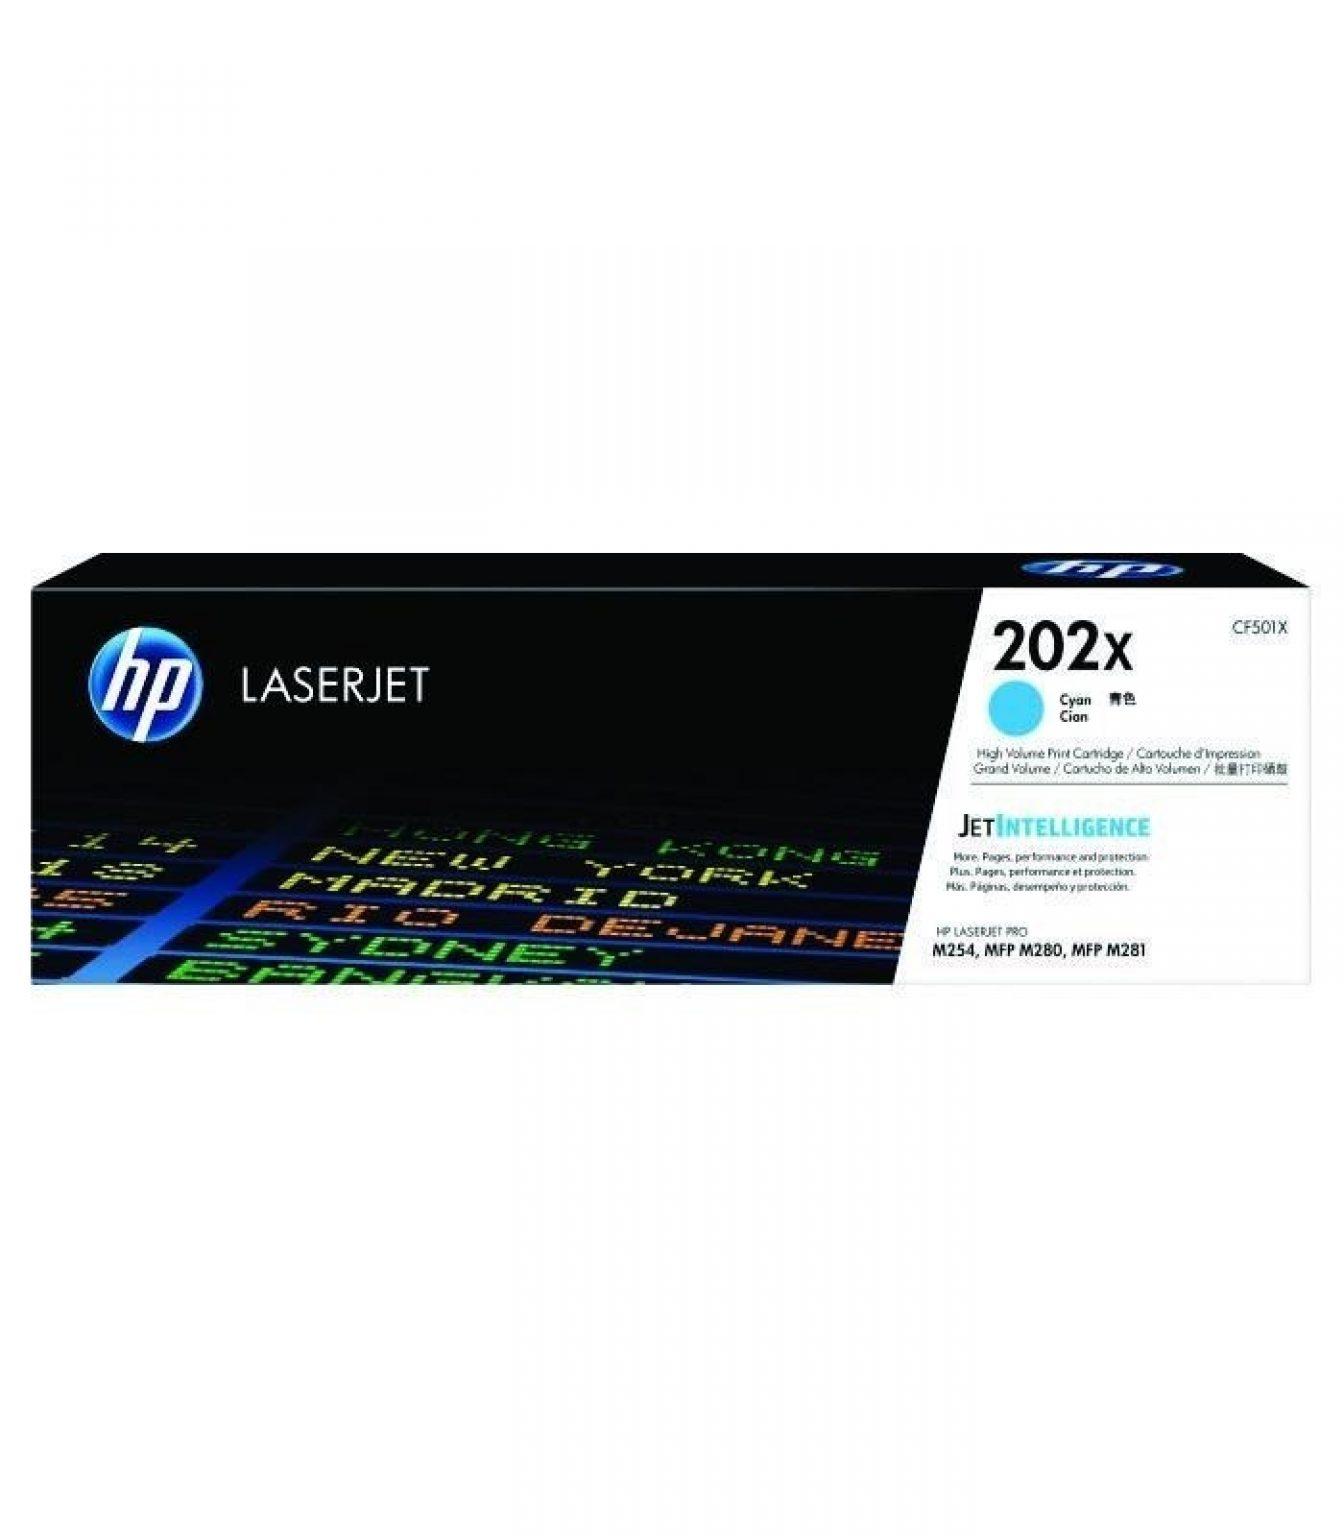 HP - 202X Cyan LaserJet Toner Cartridge [CF501X]